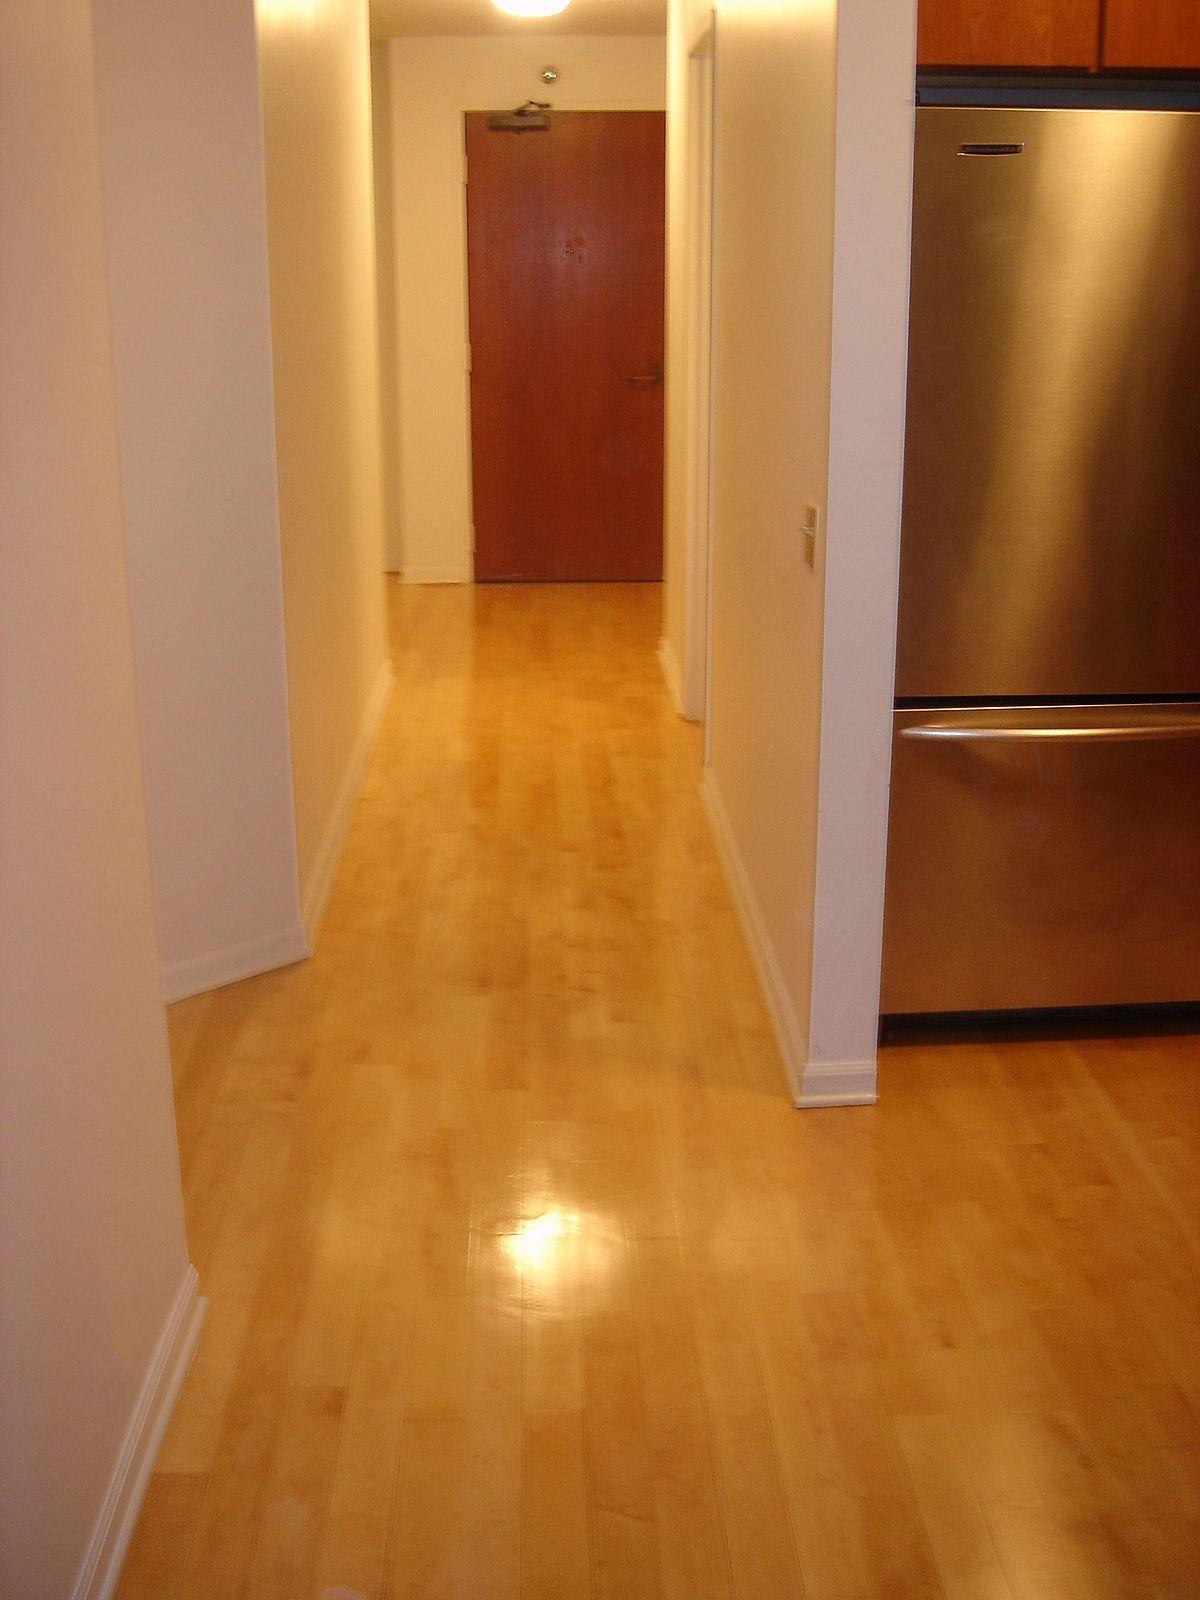 Hartco wood floor wax httpdreamhomesbyrob pinterest hartco wood floor wax diy solutioingenieria Gallery